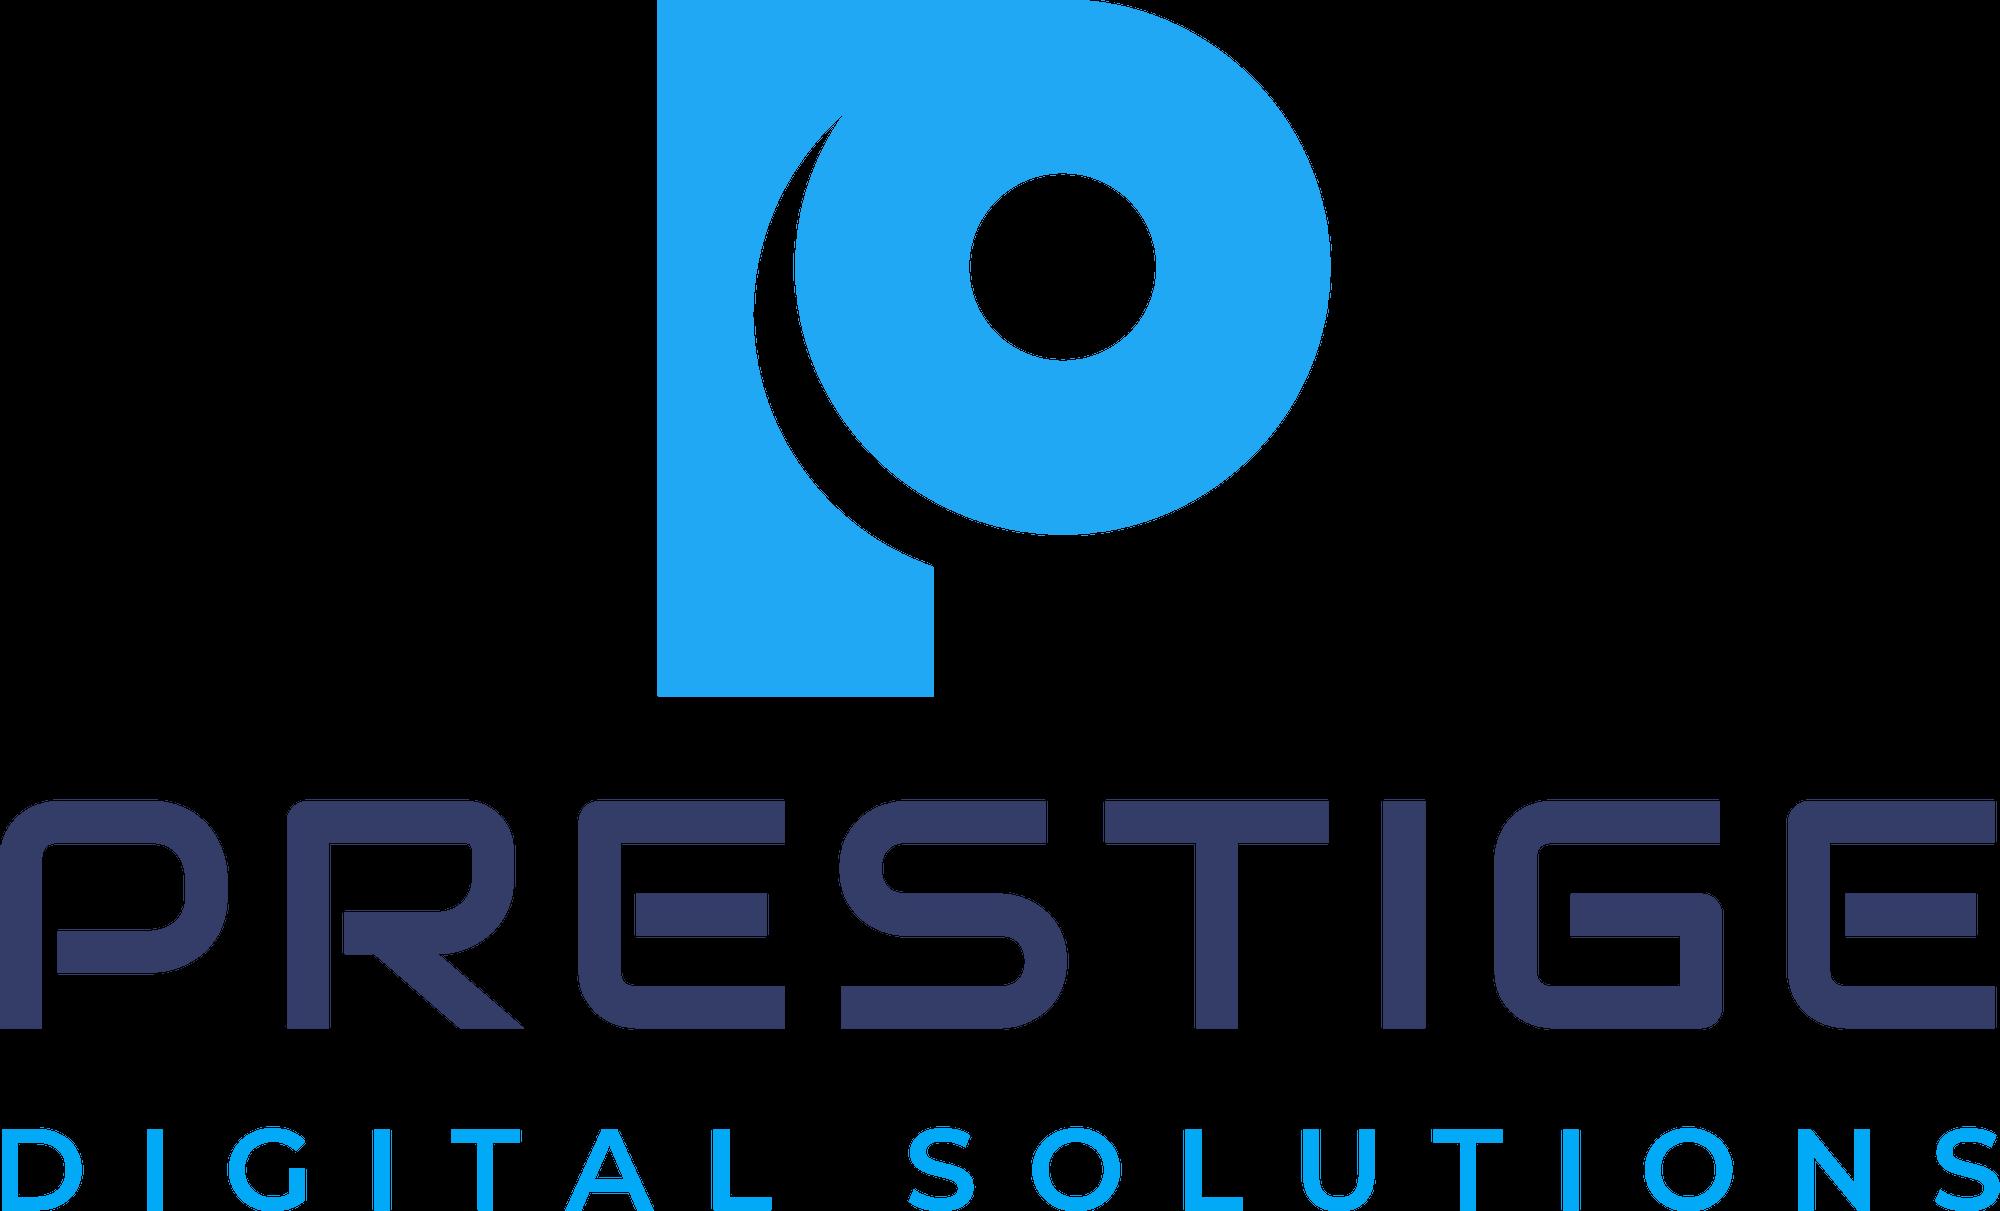 Prestige Digital Solutions Logo blue original